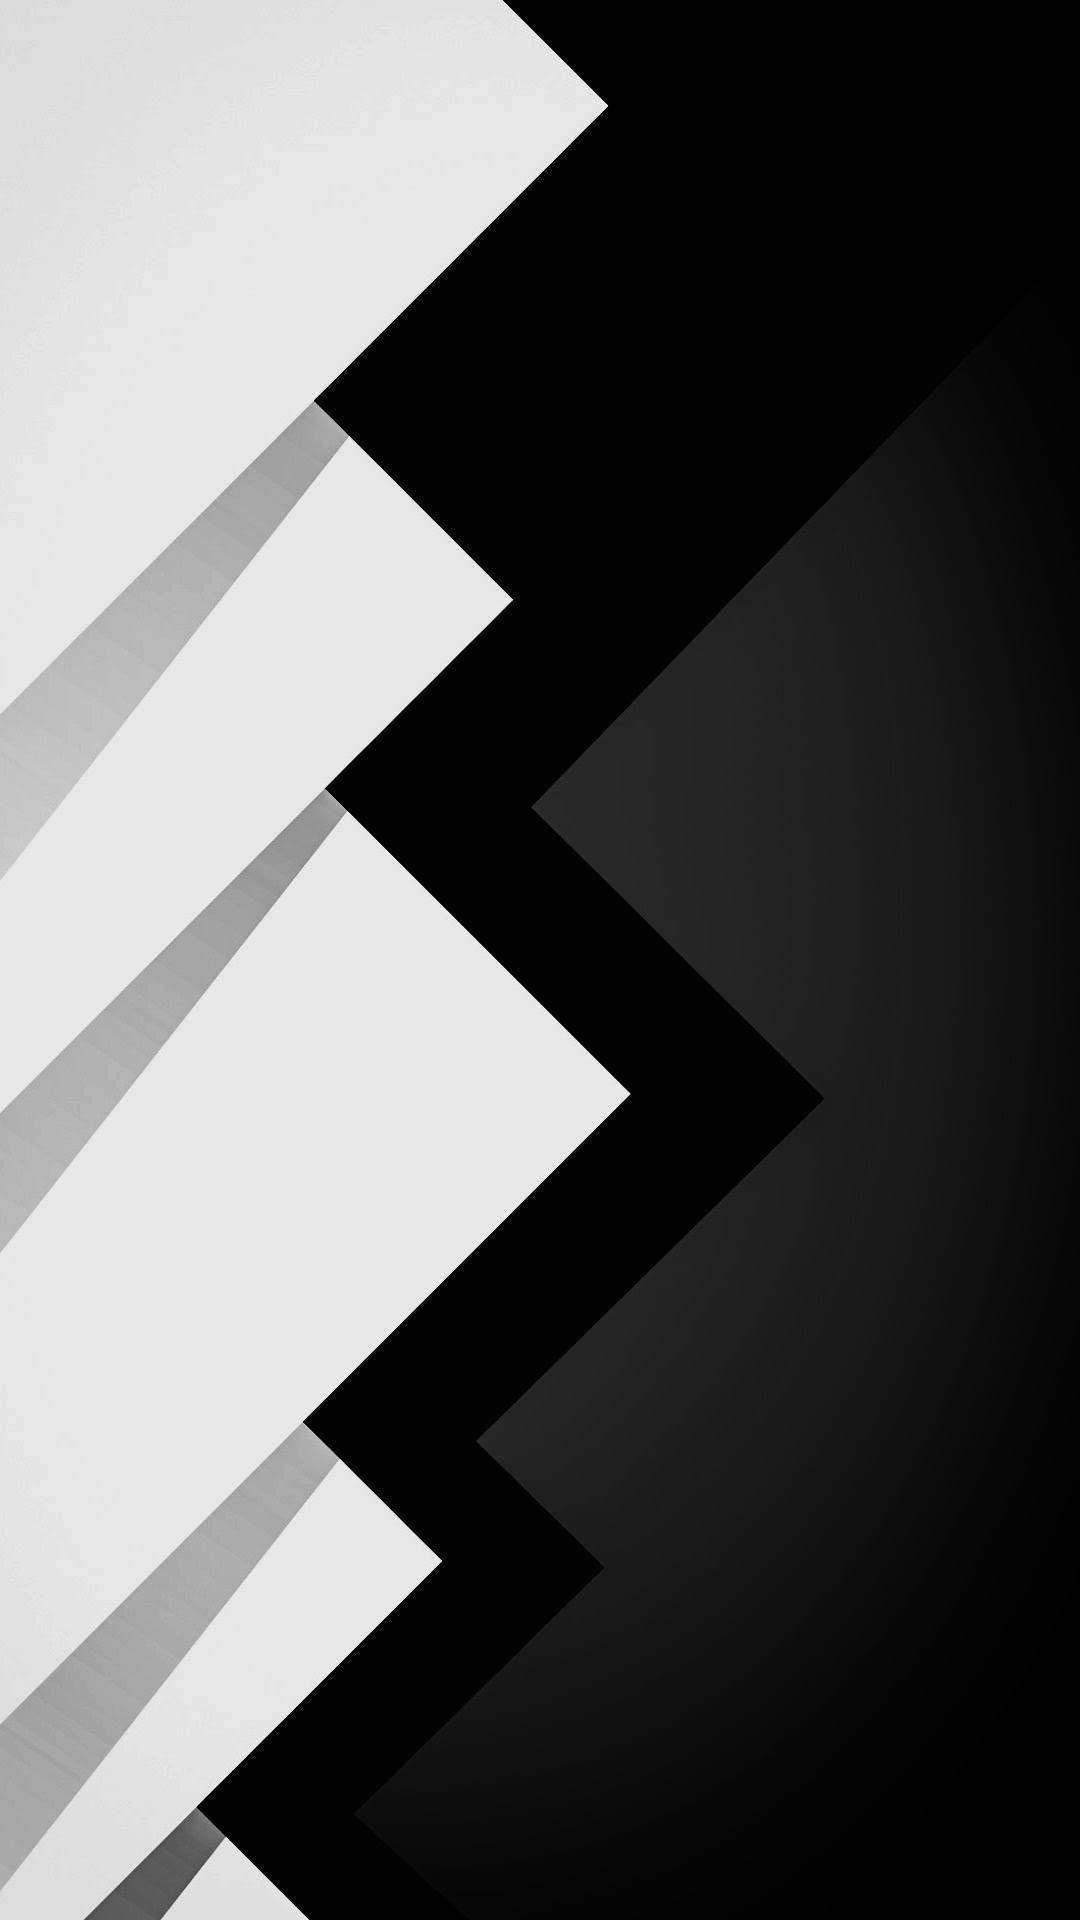 Black And White phone wallpaper